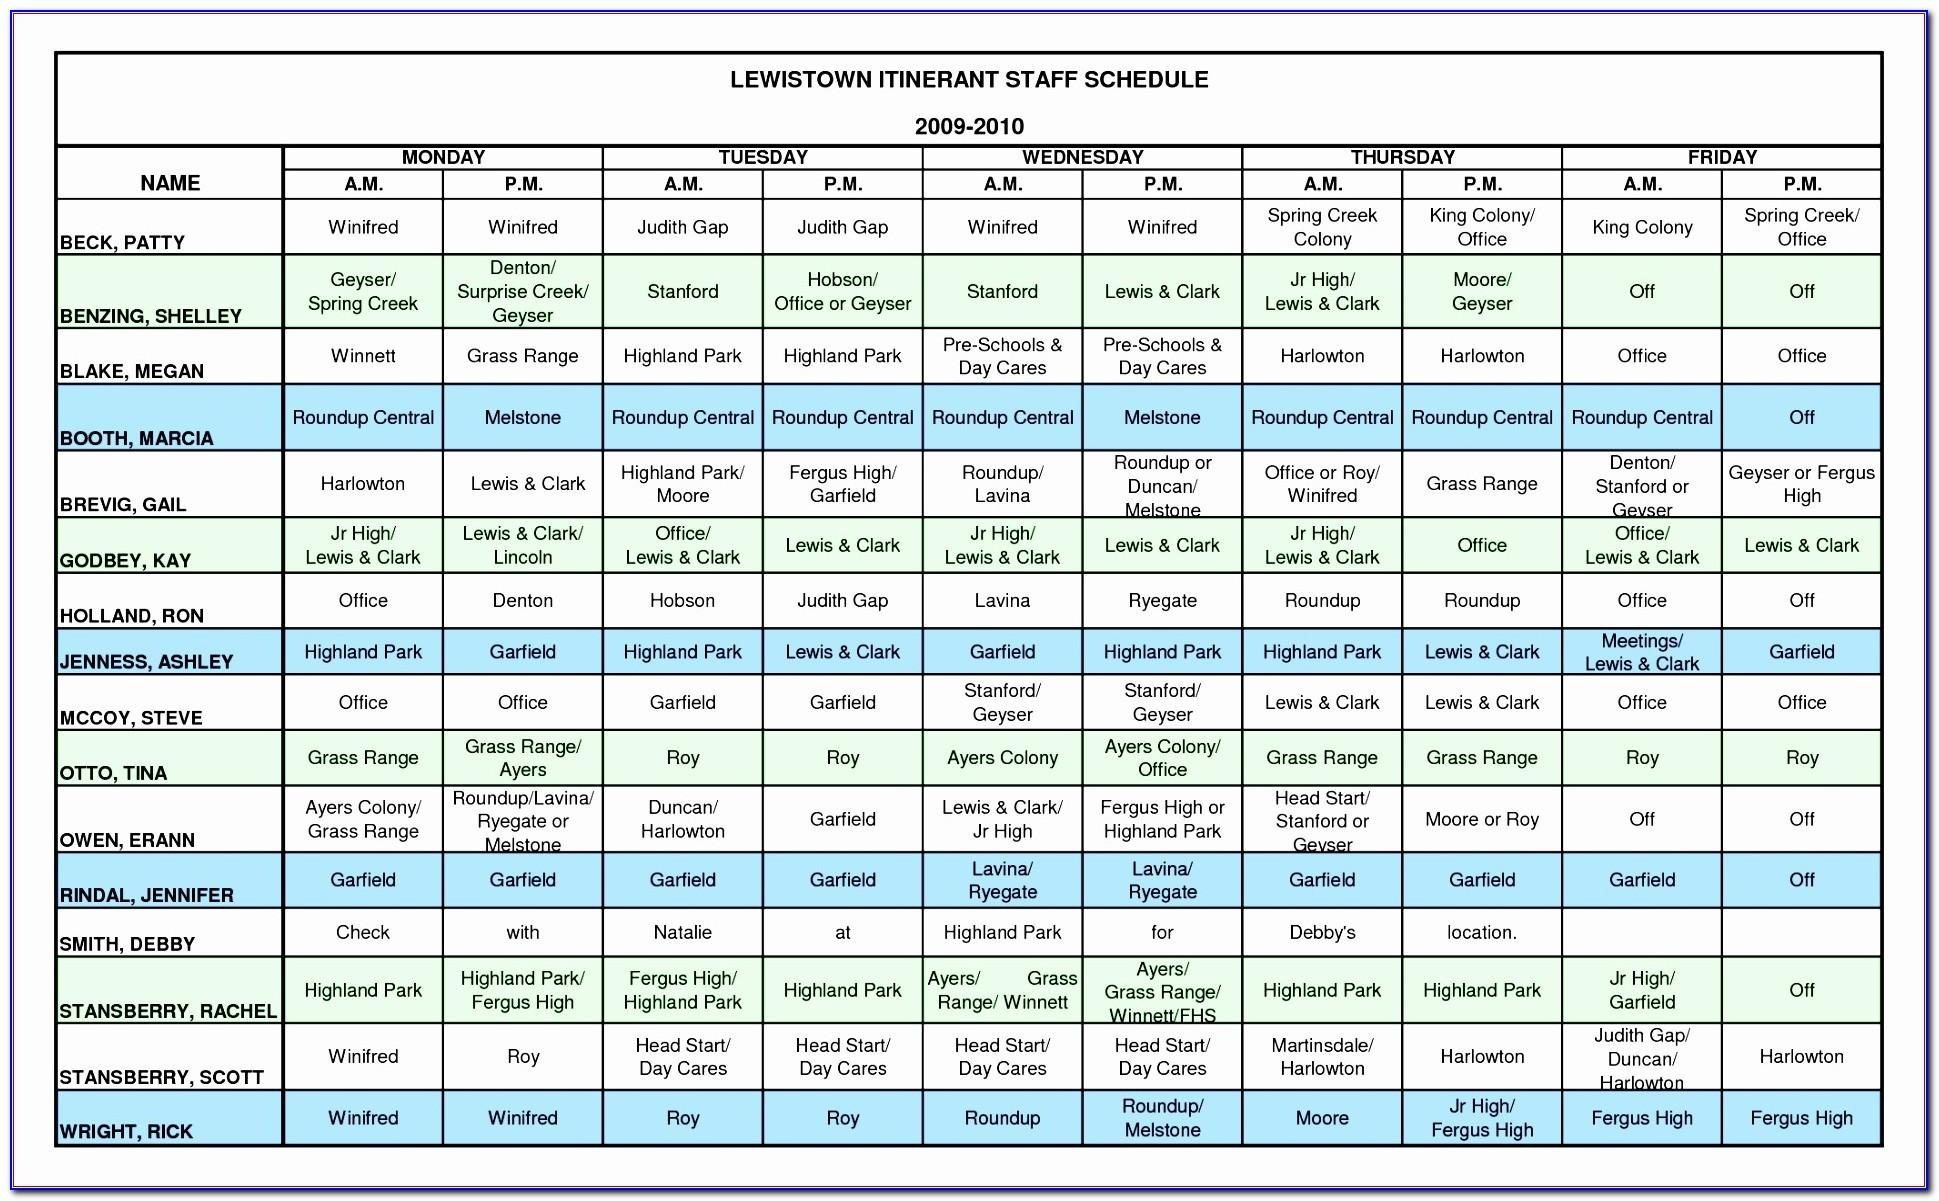 Staffing Schedule Template Excel